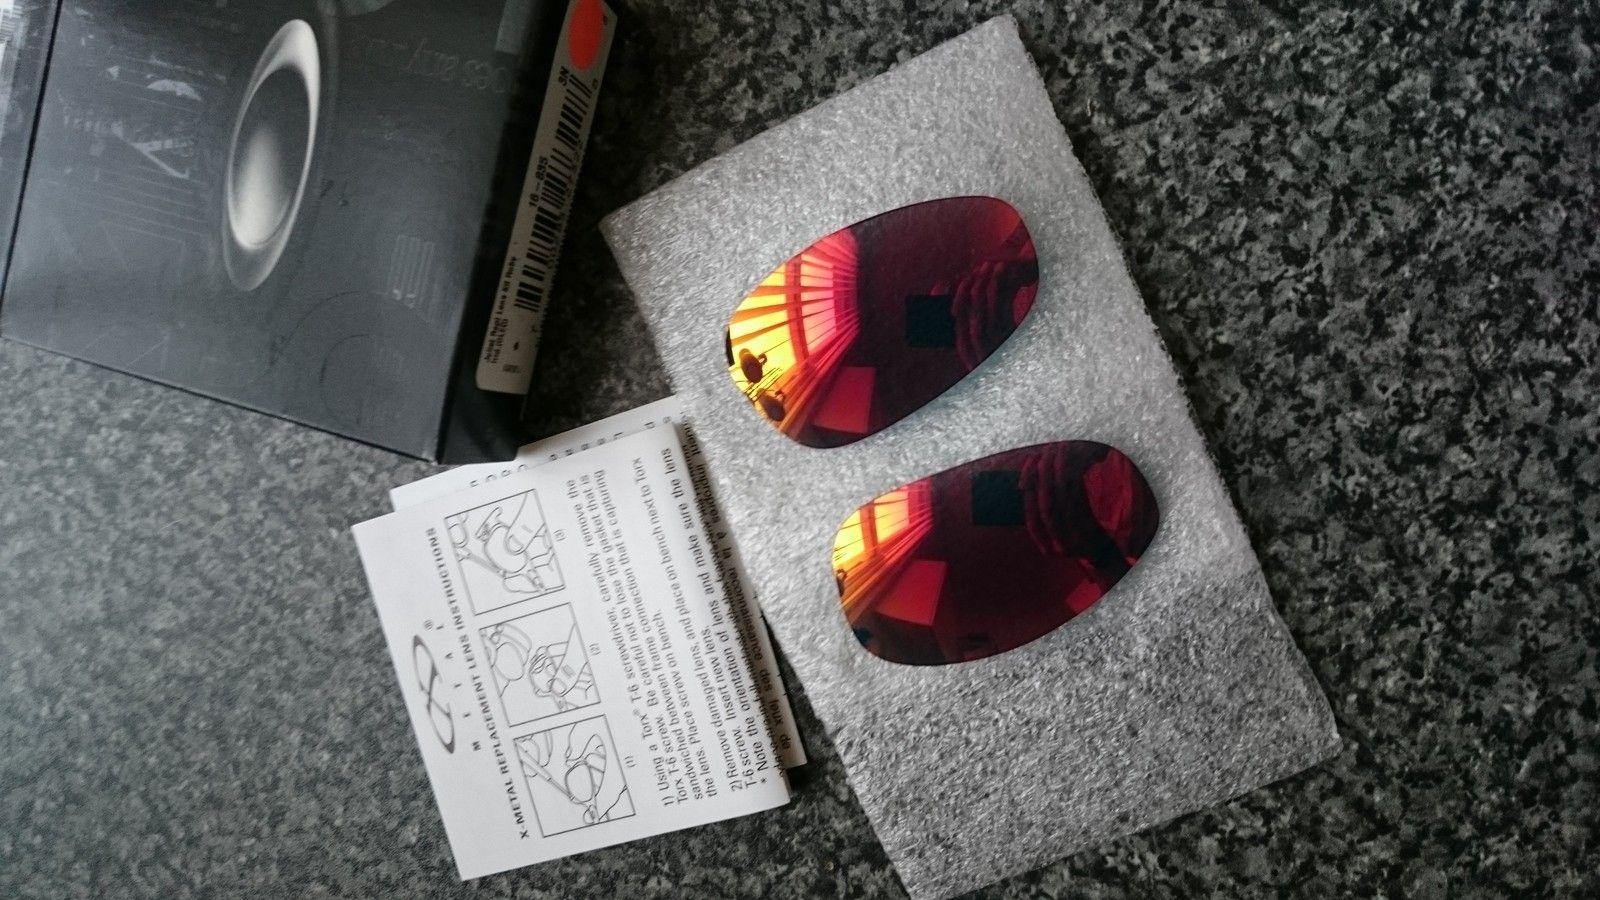 BNIB Juliet Ruby lenses - 1450354571109-1691427968.jpg